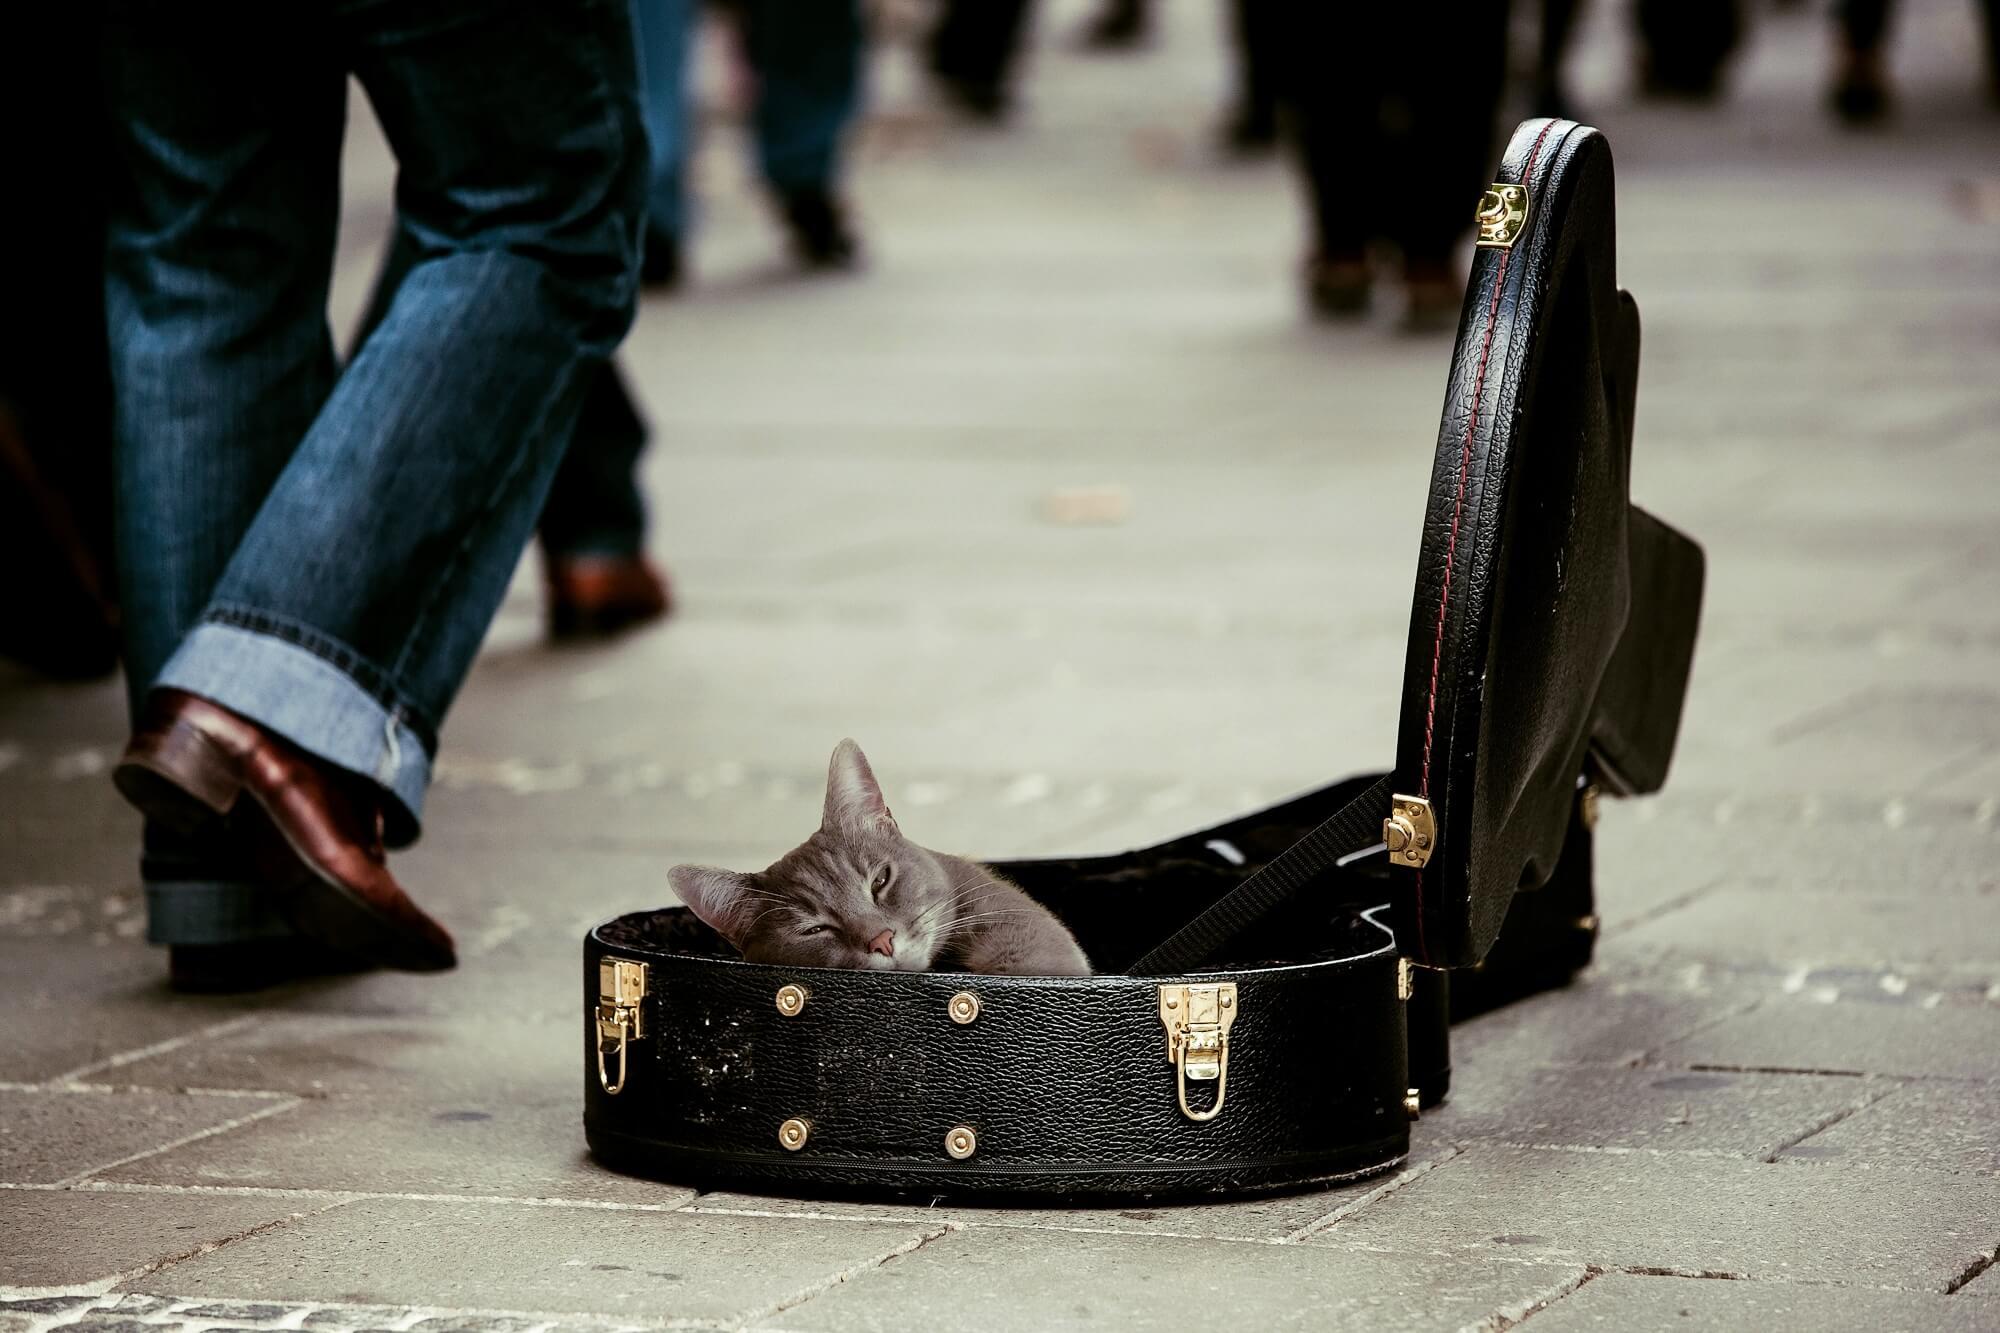 cat in guitar box